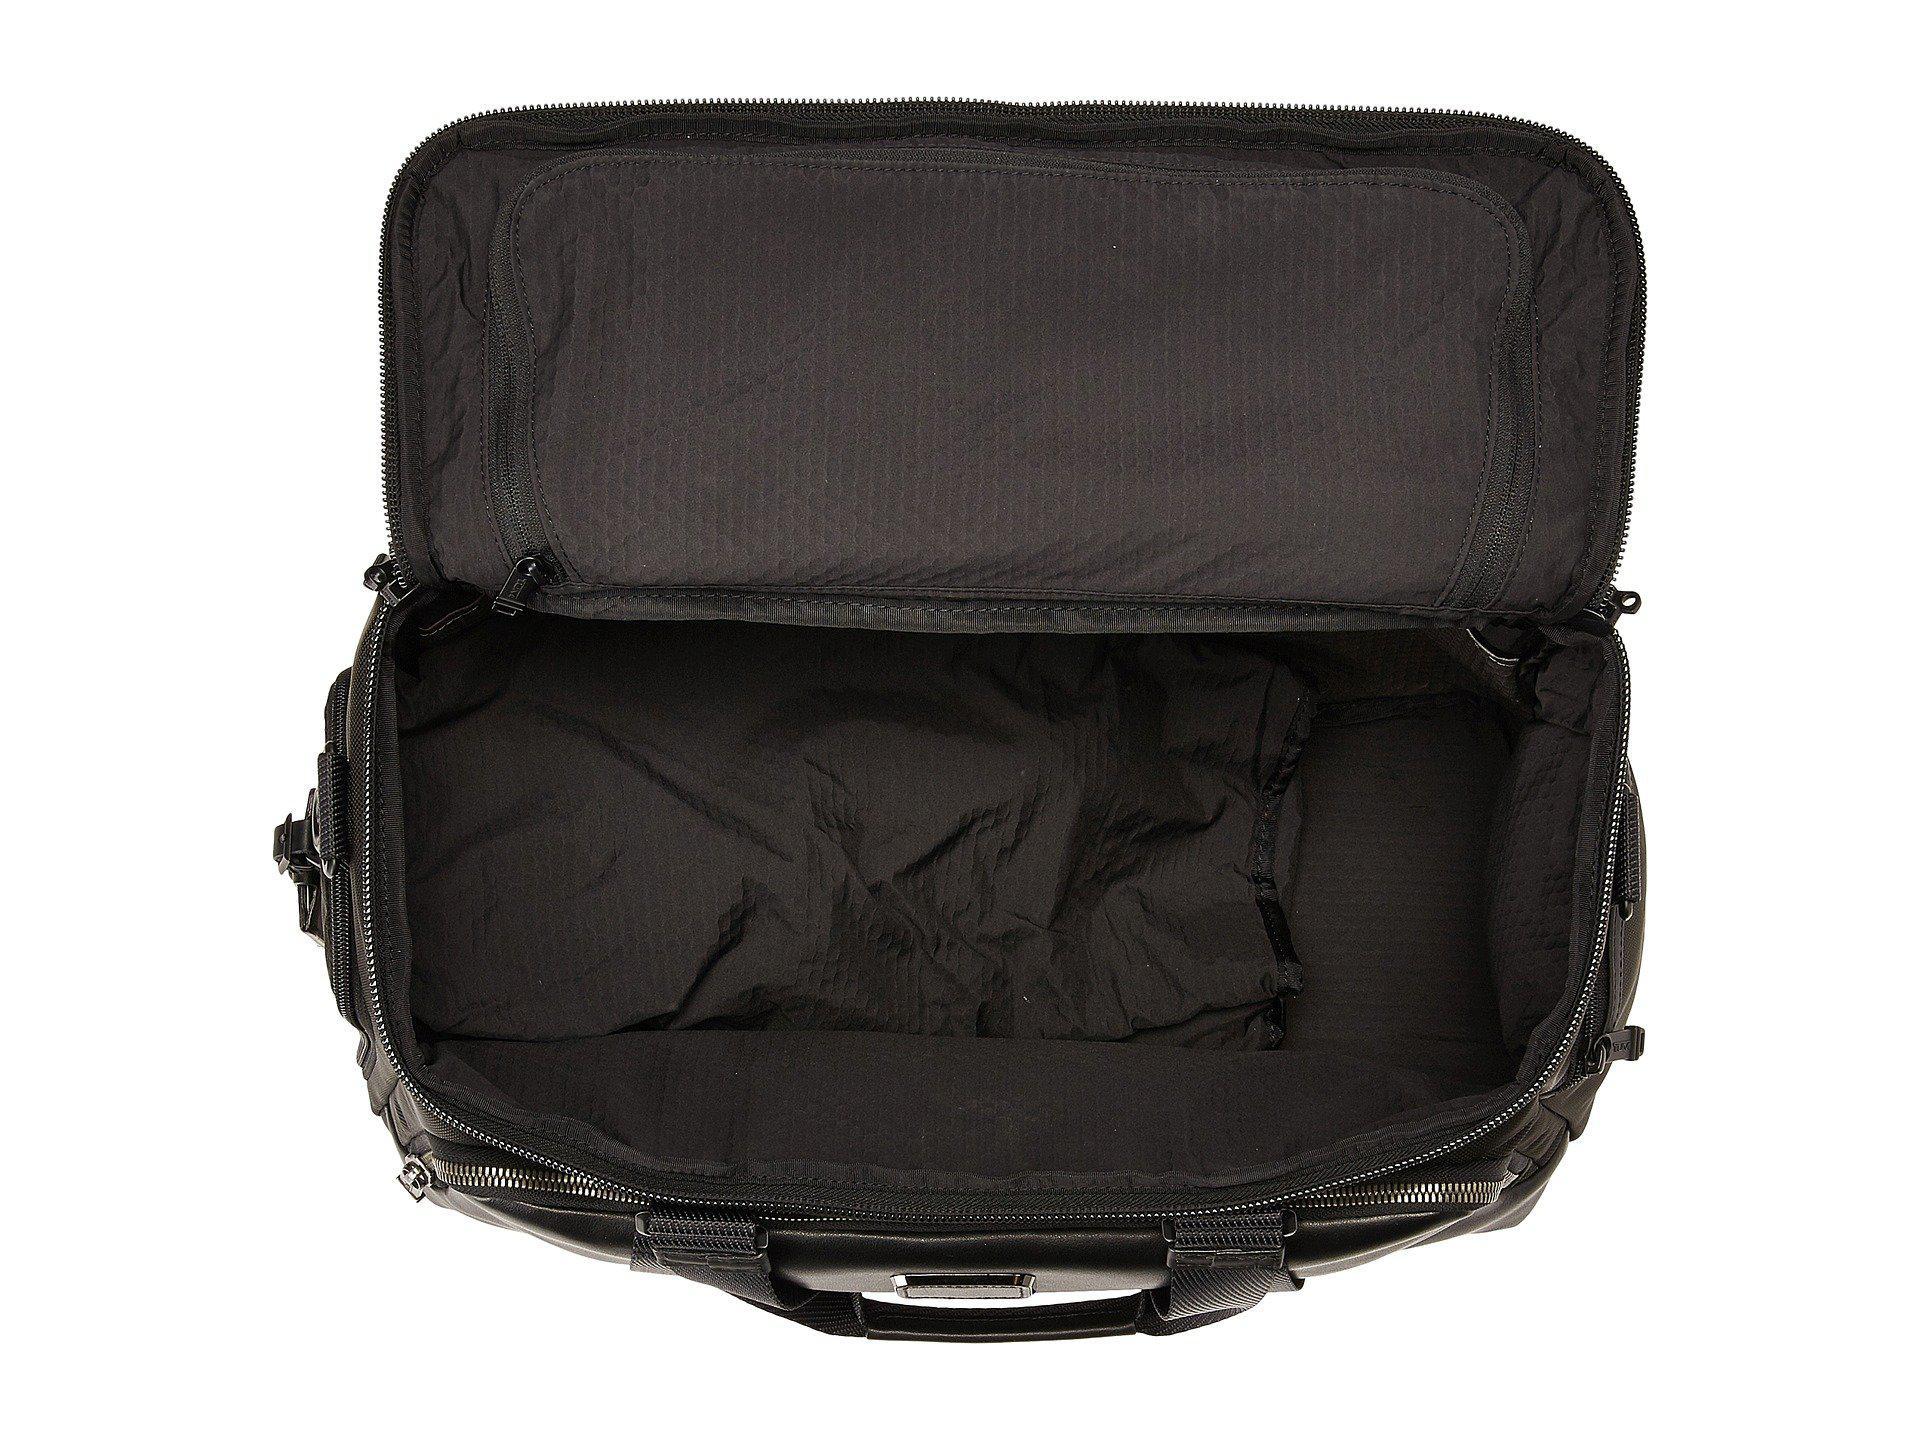 7a4a234e081 Tumi - Alpha Bravo Mccoy Gym Bag (black) Messenger Bags for Men - Lyst.  View fullscreen